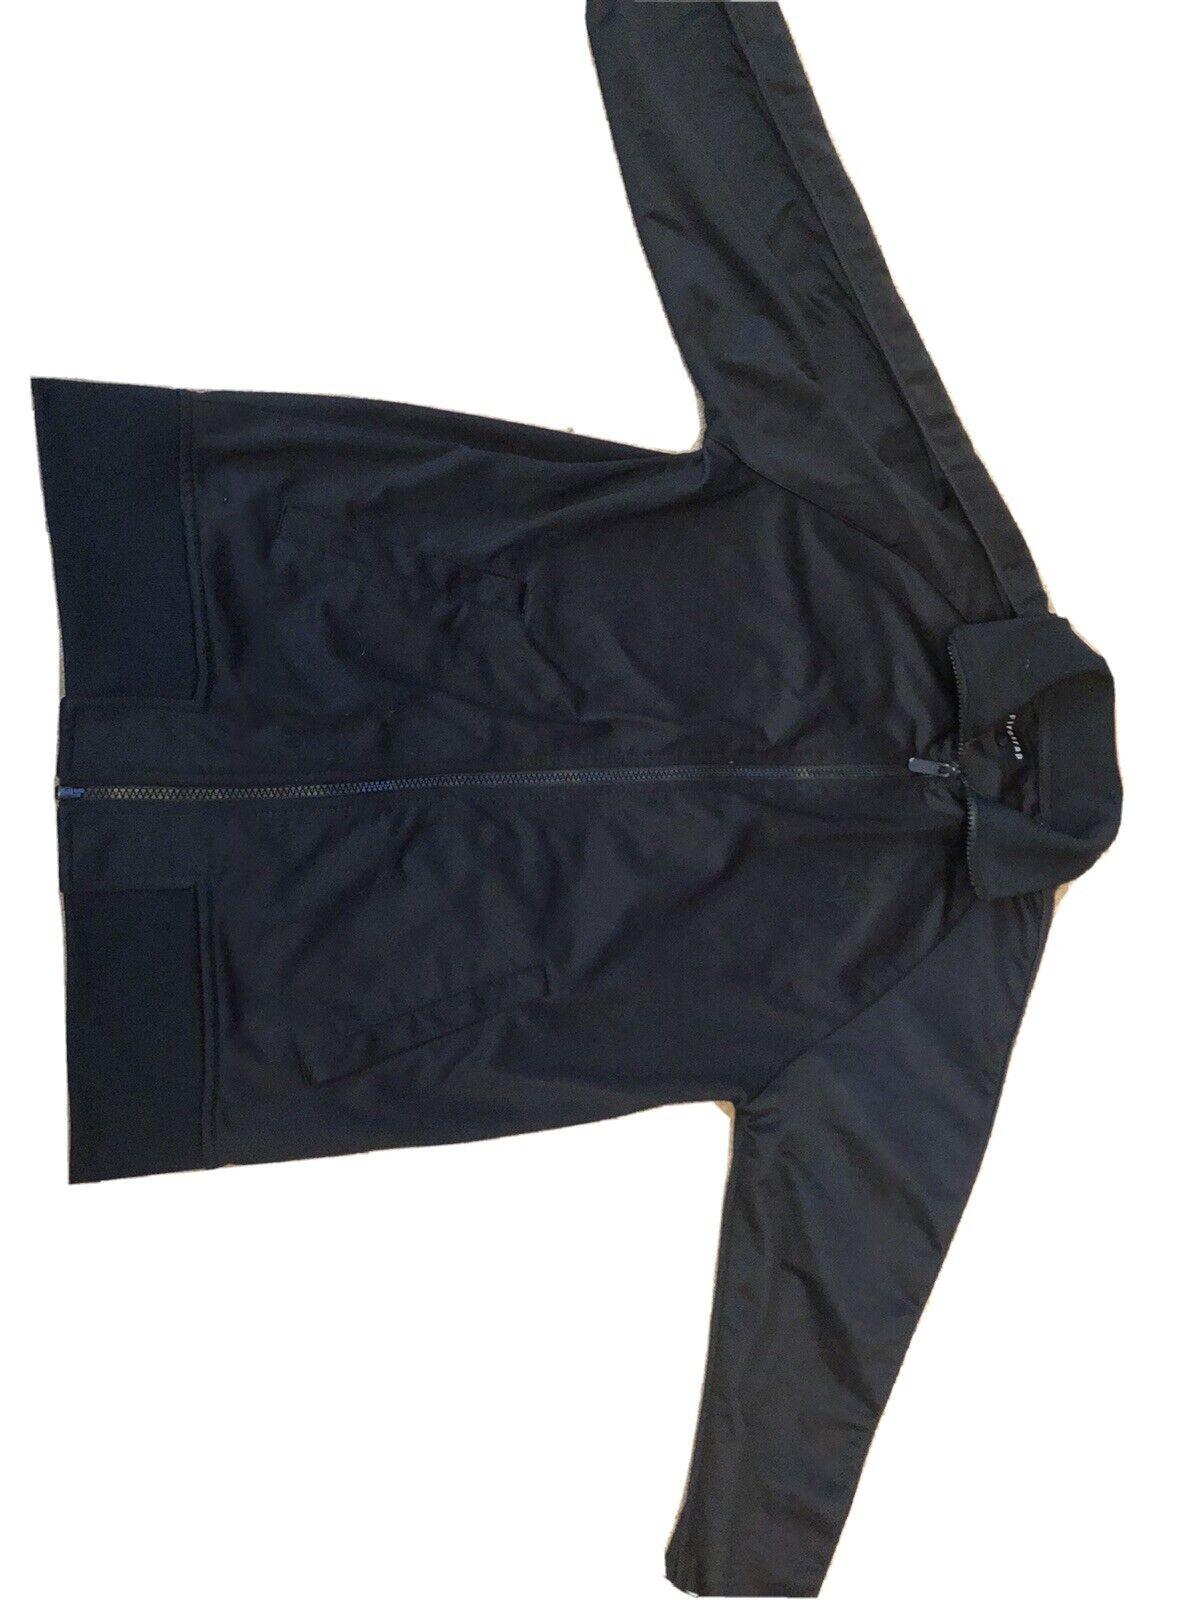 Firetrap Mens Boys Black Sweatshirt Jacket Zip Top Size Small, Hardly Worn